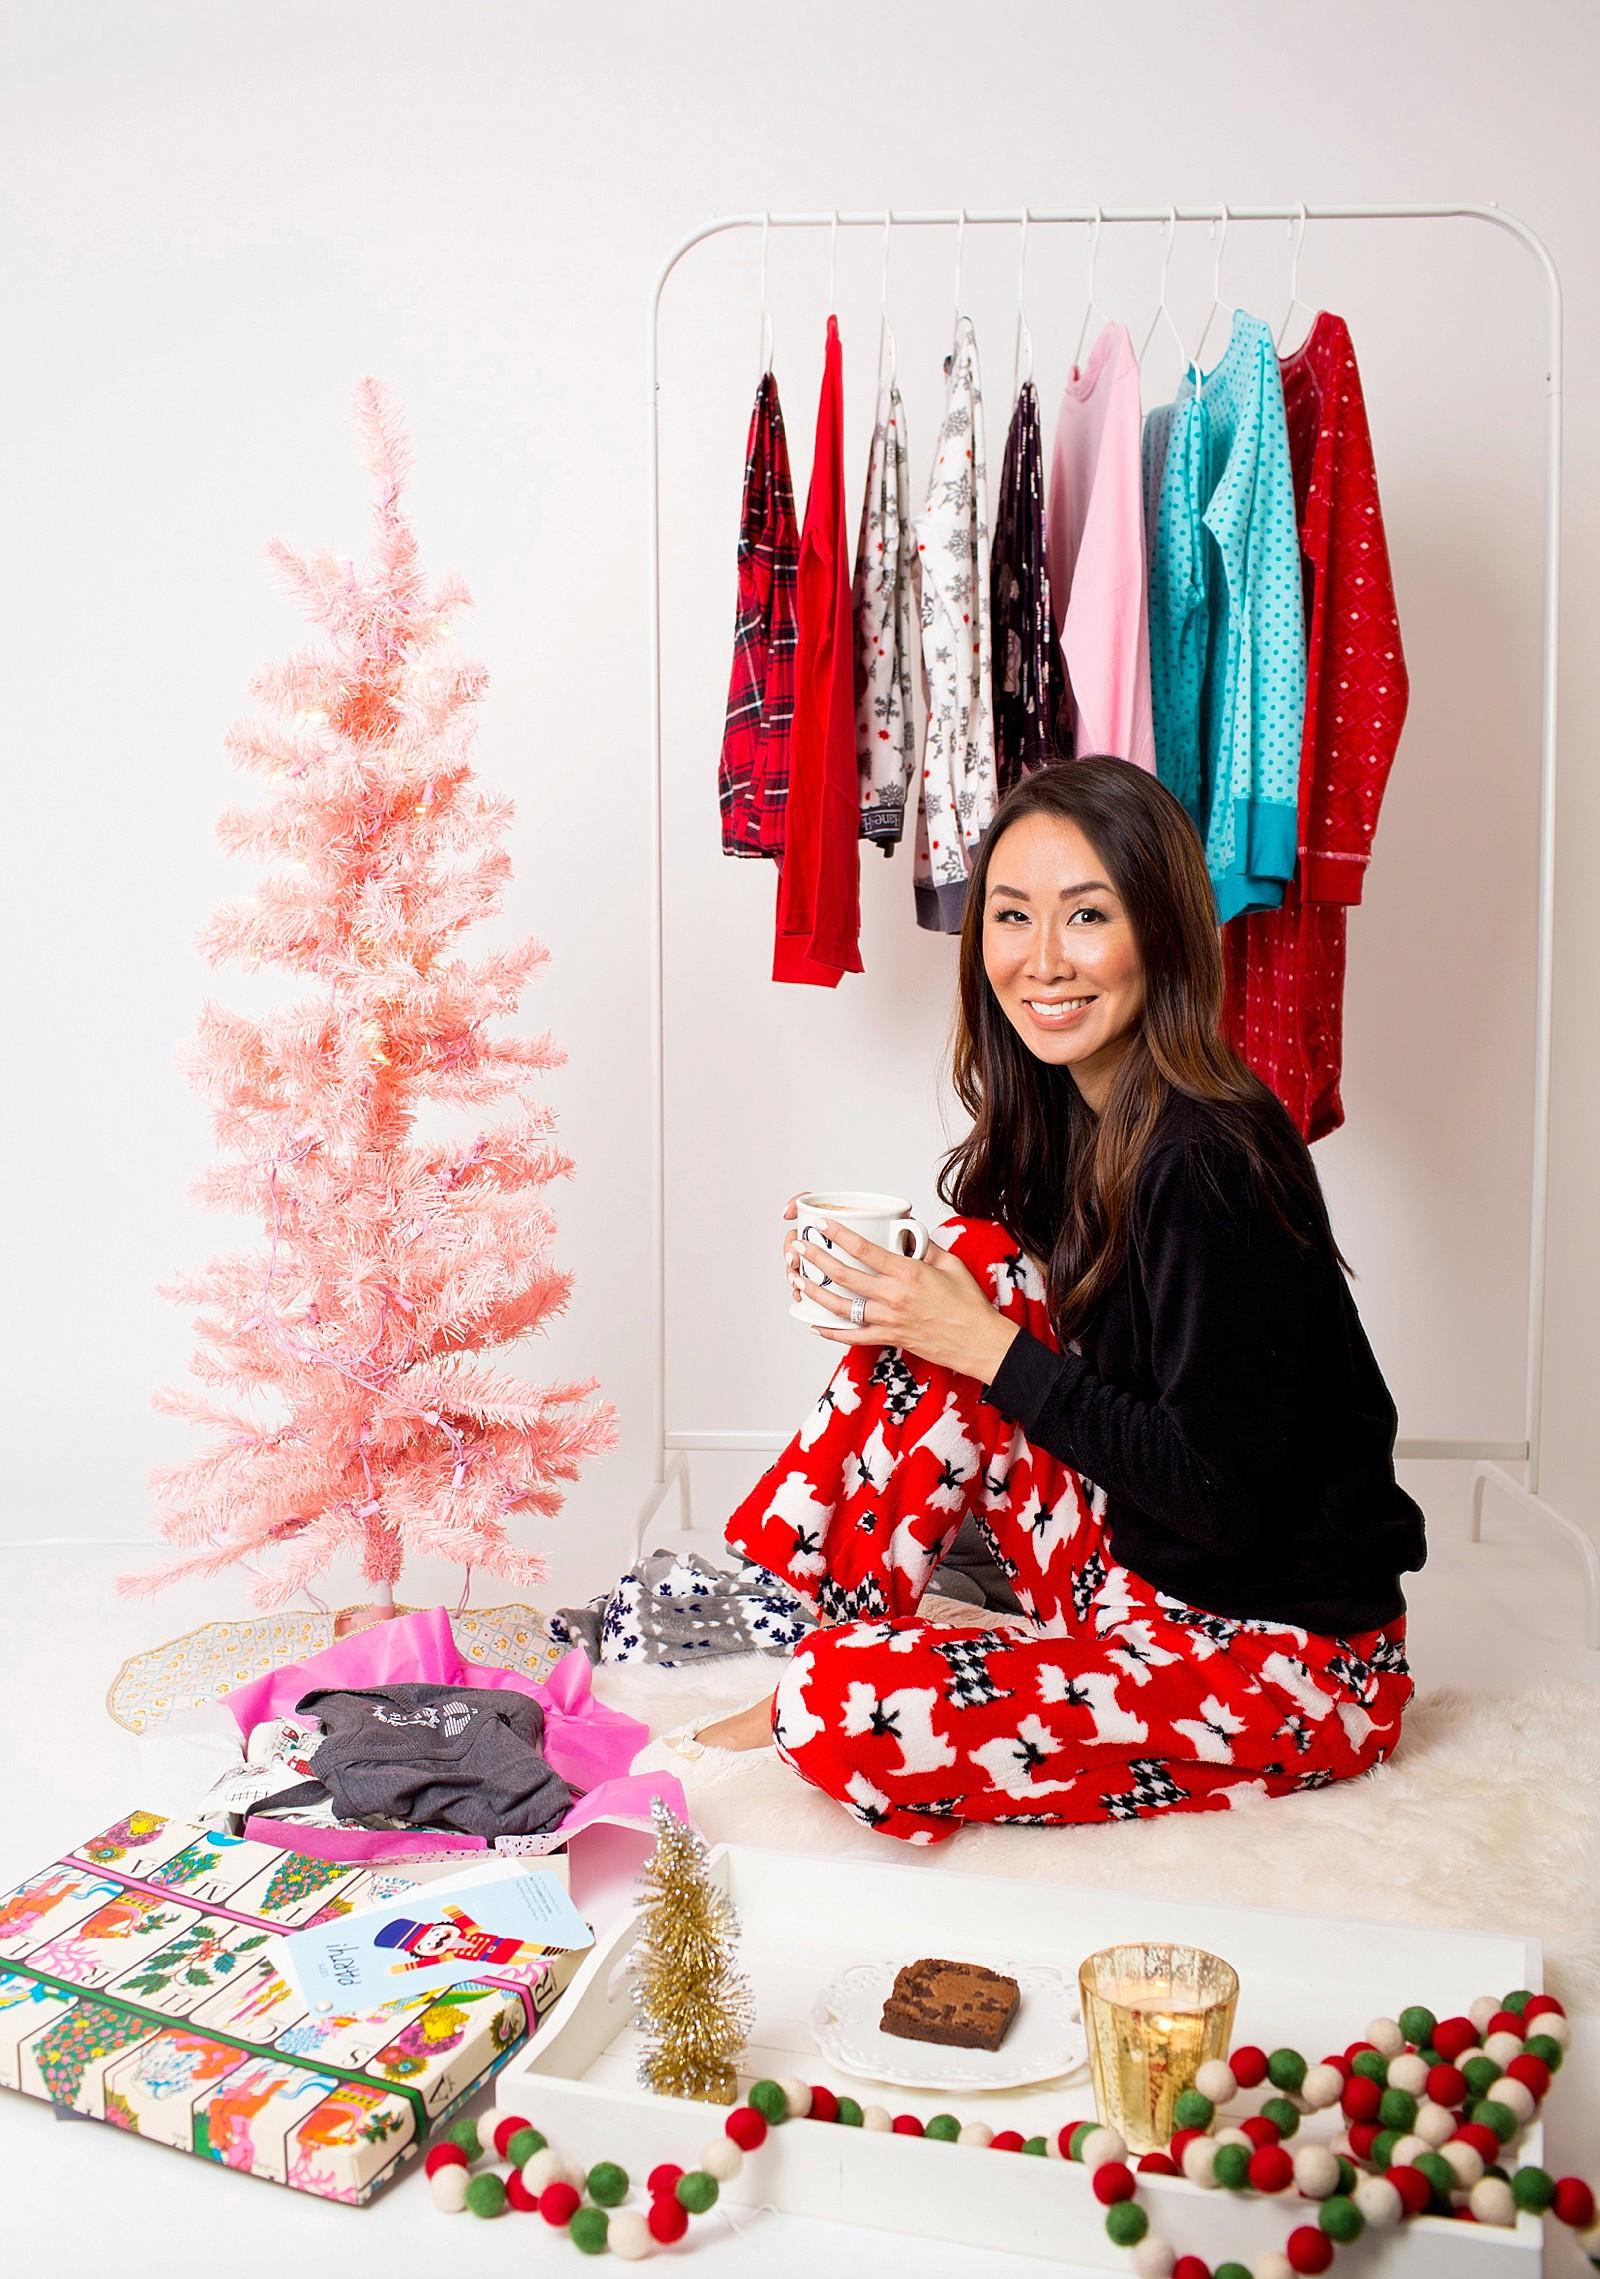 hanes-christmas-pajamas-girls-pajama-party-ideas-cute-jammies-diana-elizabeth-lifestyle-fashion-blogger-phoenix-arizona-1695a